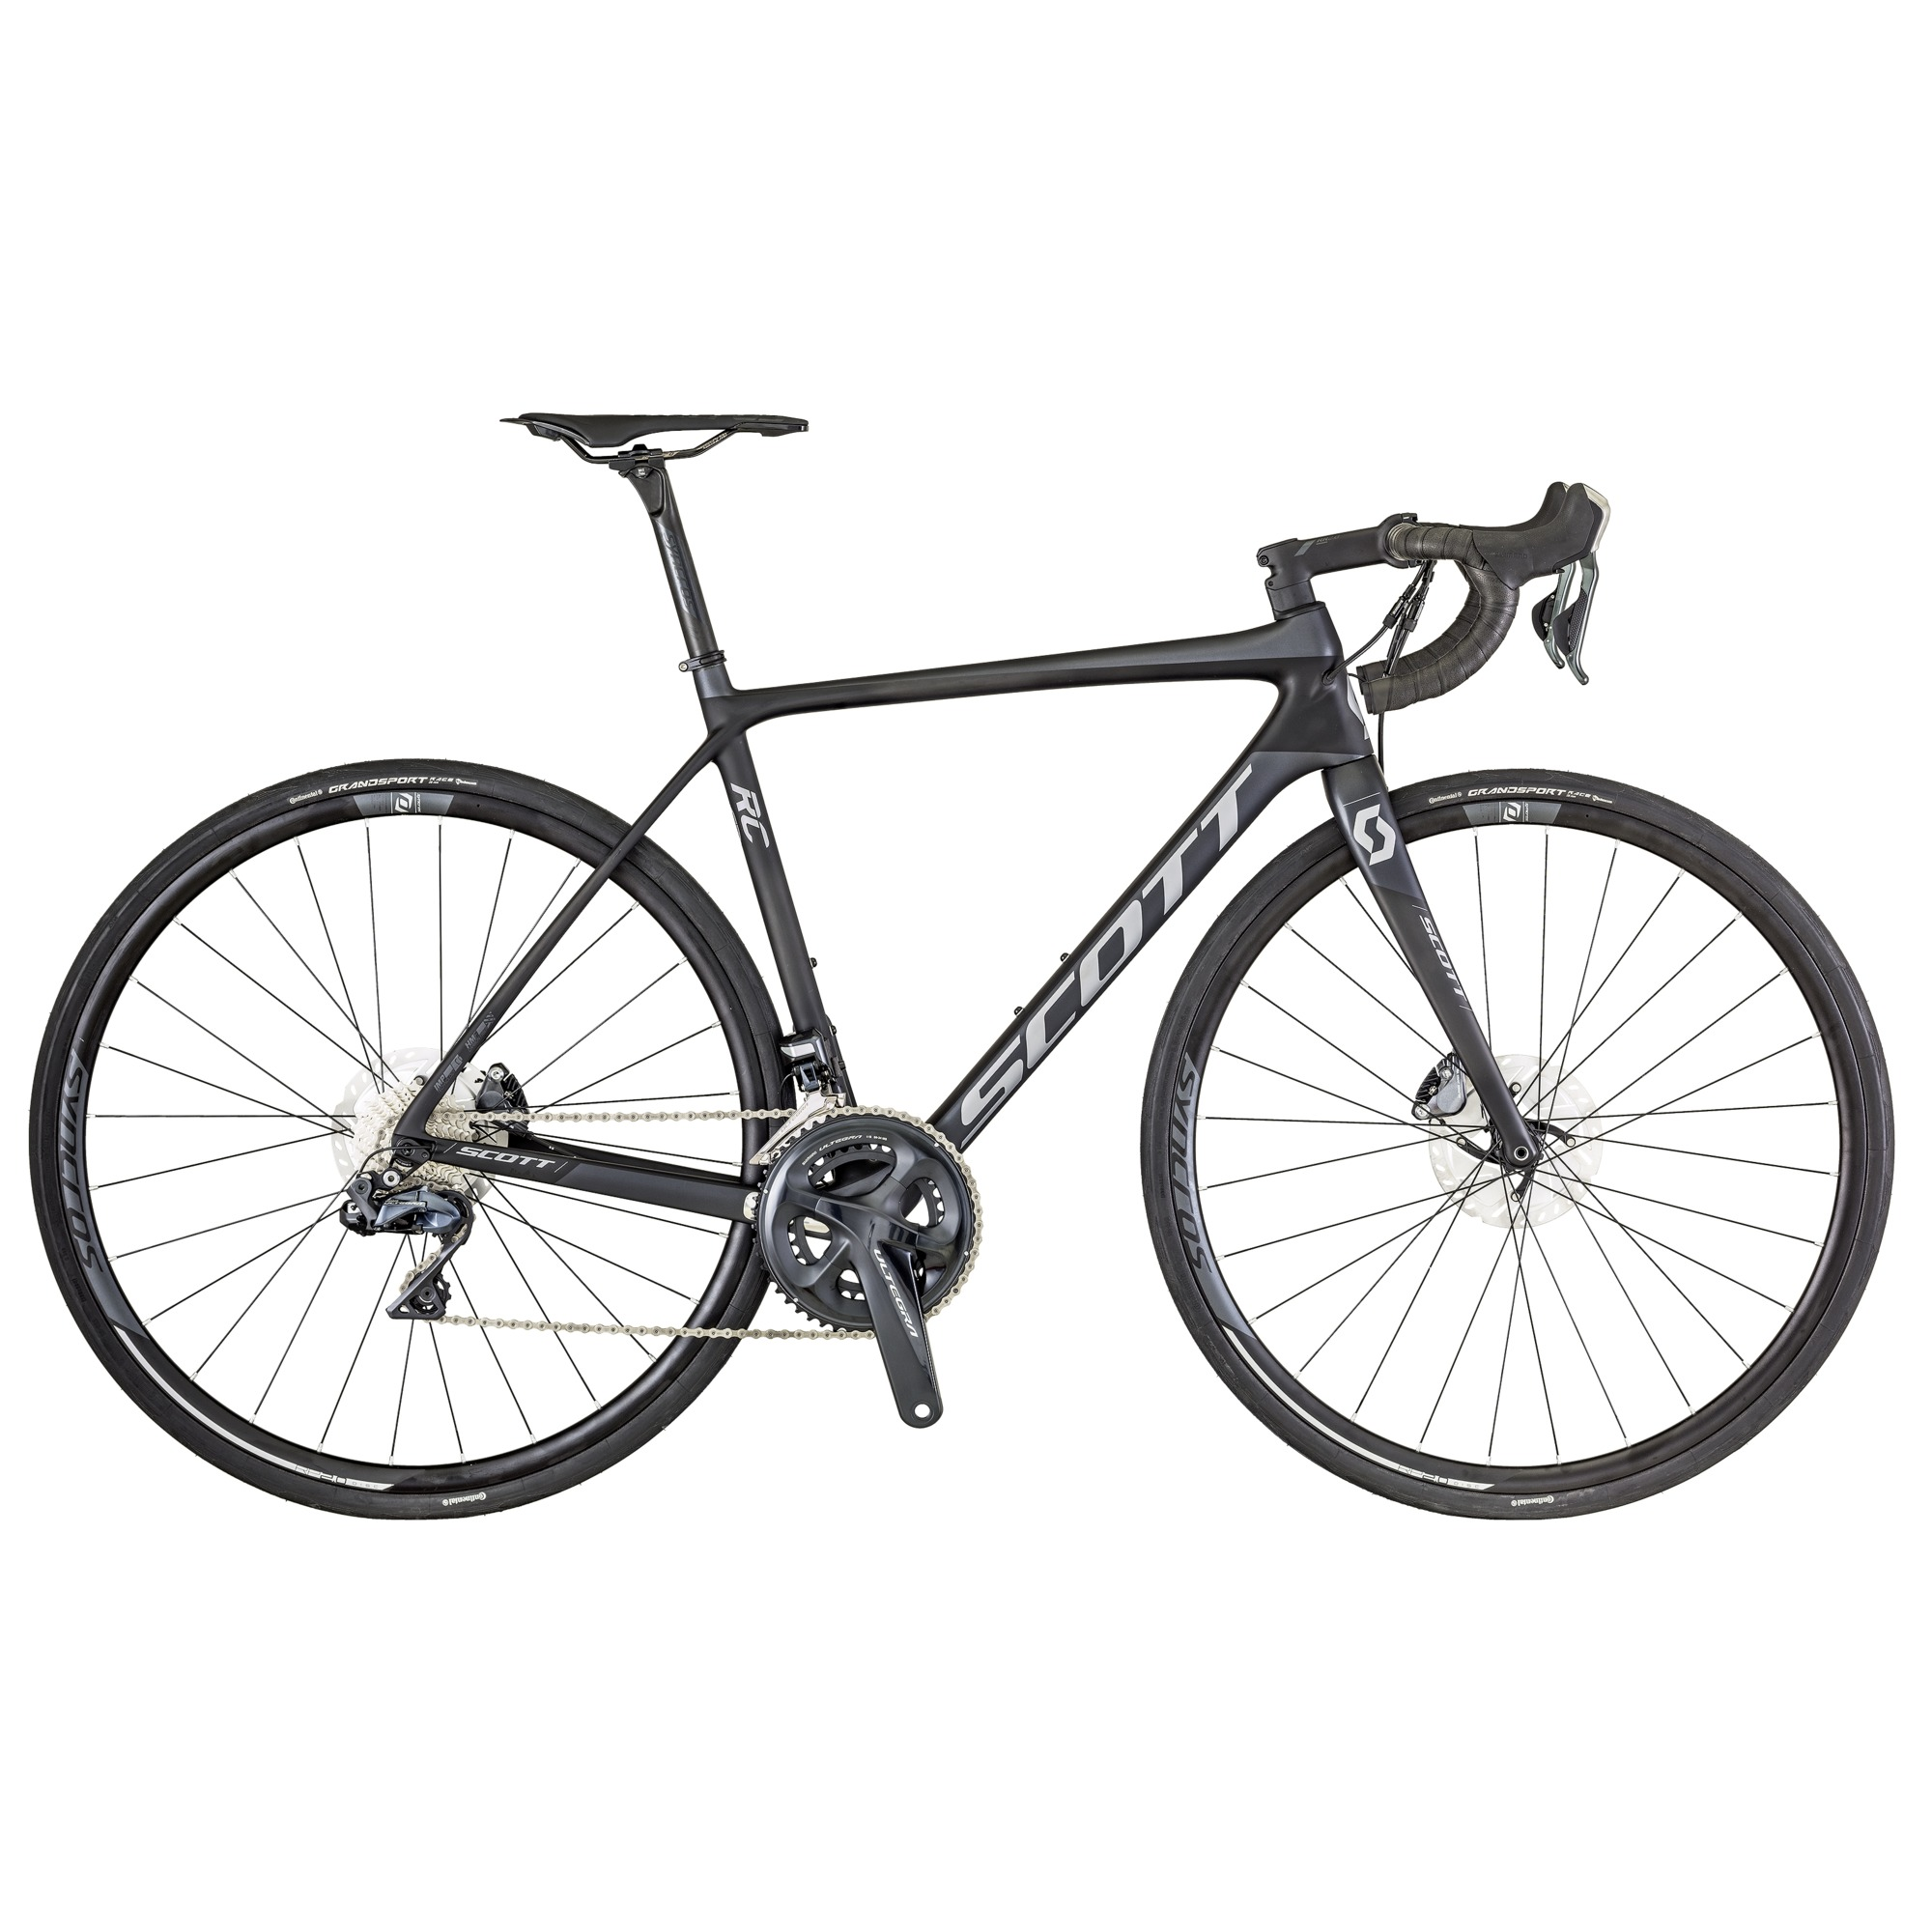 SCOTT Addict RC 15 Disc Bike L56 - Zweirad Homann